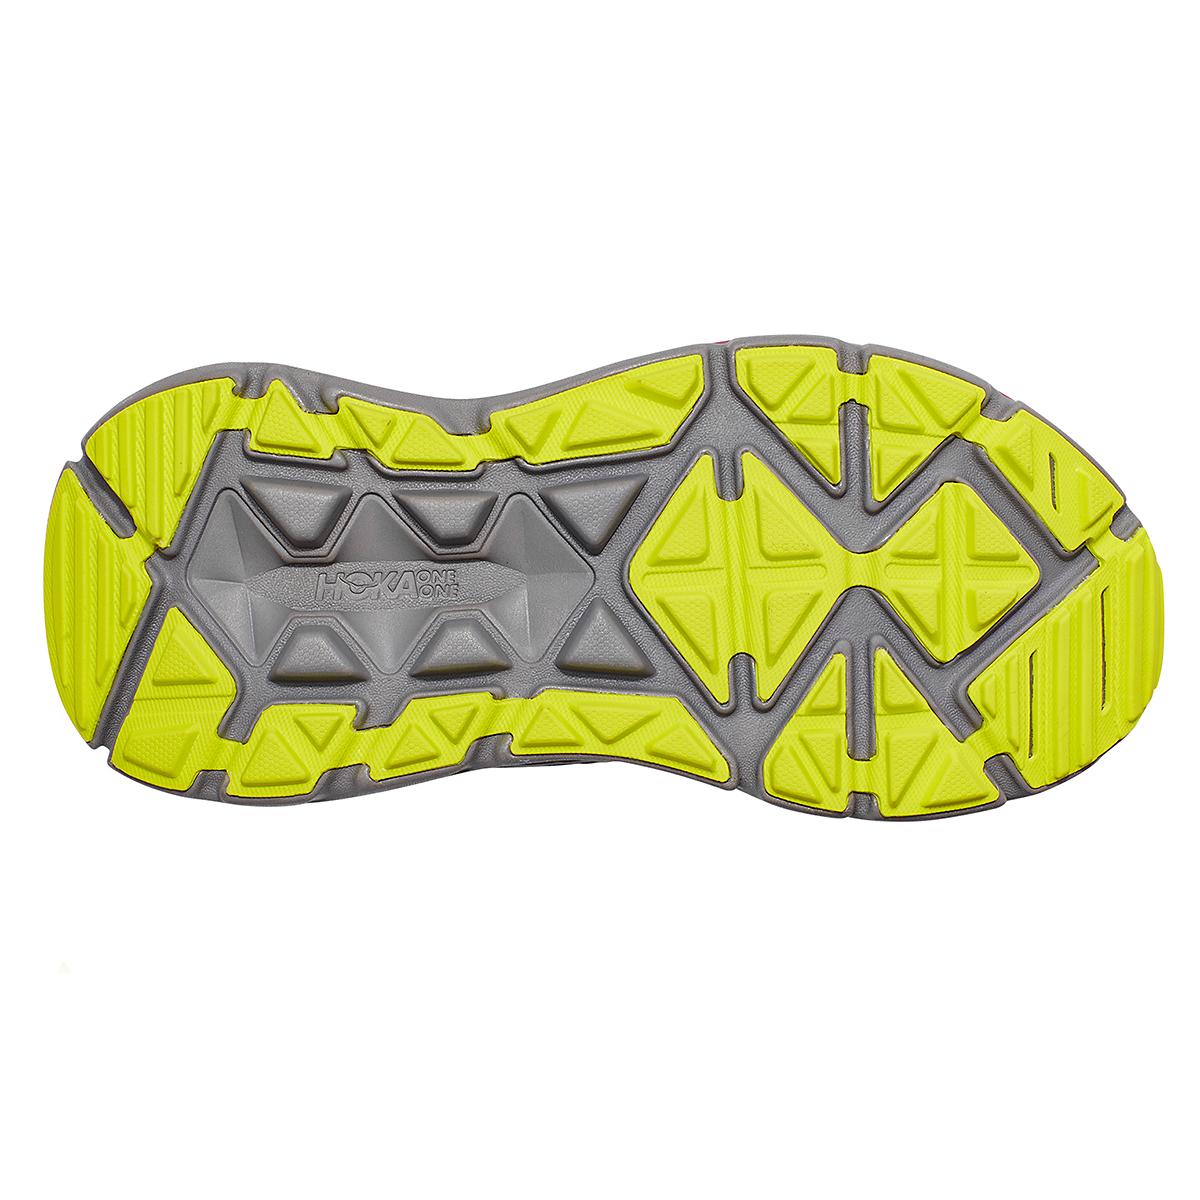 Women's Hoka One One Stinson Atr 6 Trail Running Shoe - Color: Deep Well/Evening Primrose - Size: 5 - Width: Regular, Deep Well/Evening Primrose, large, image 3